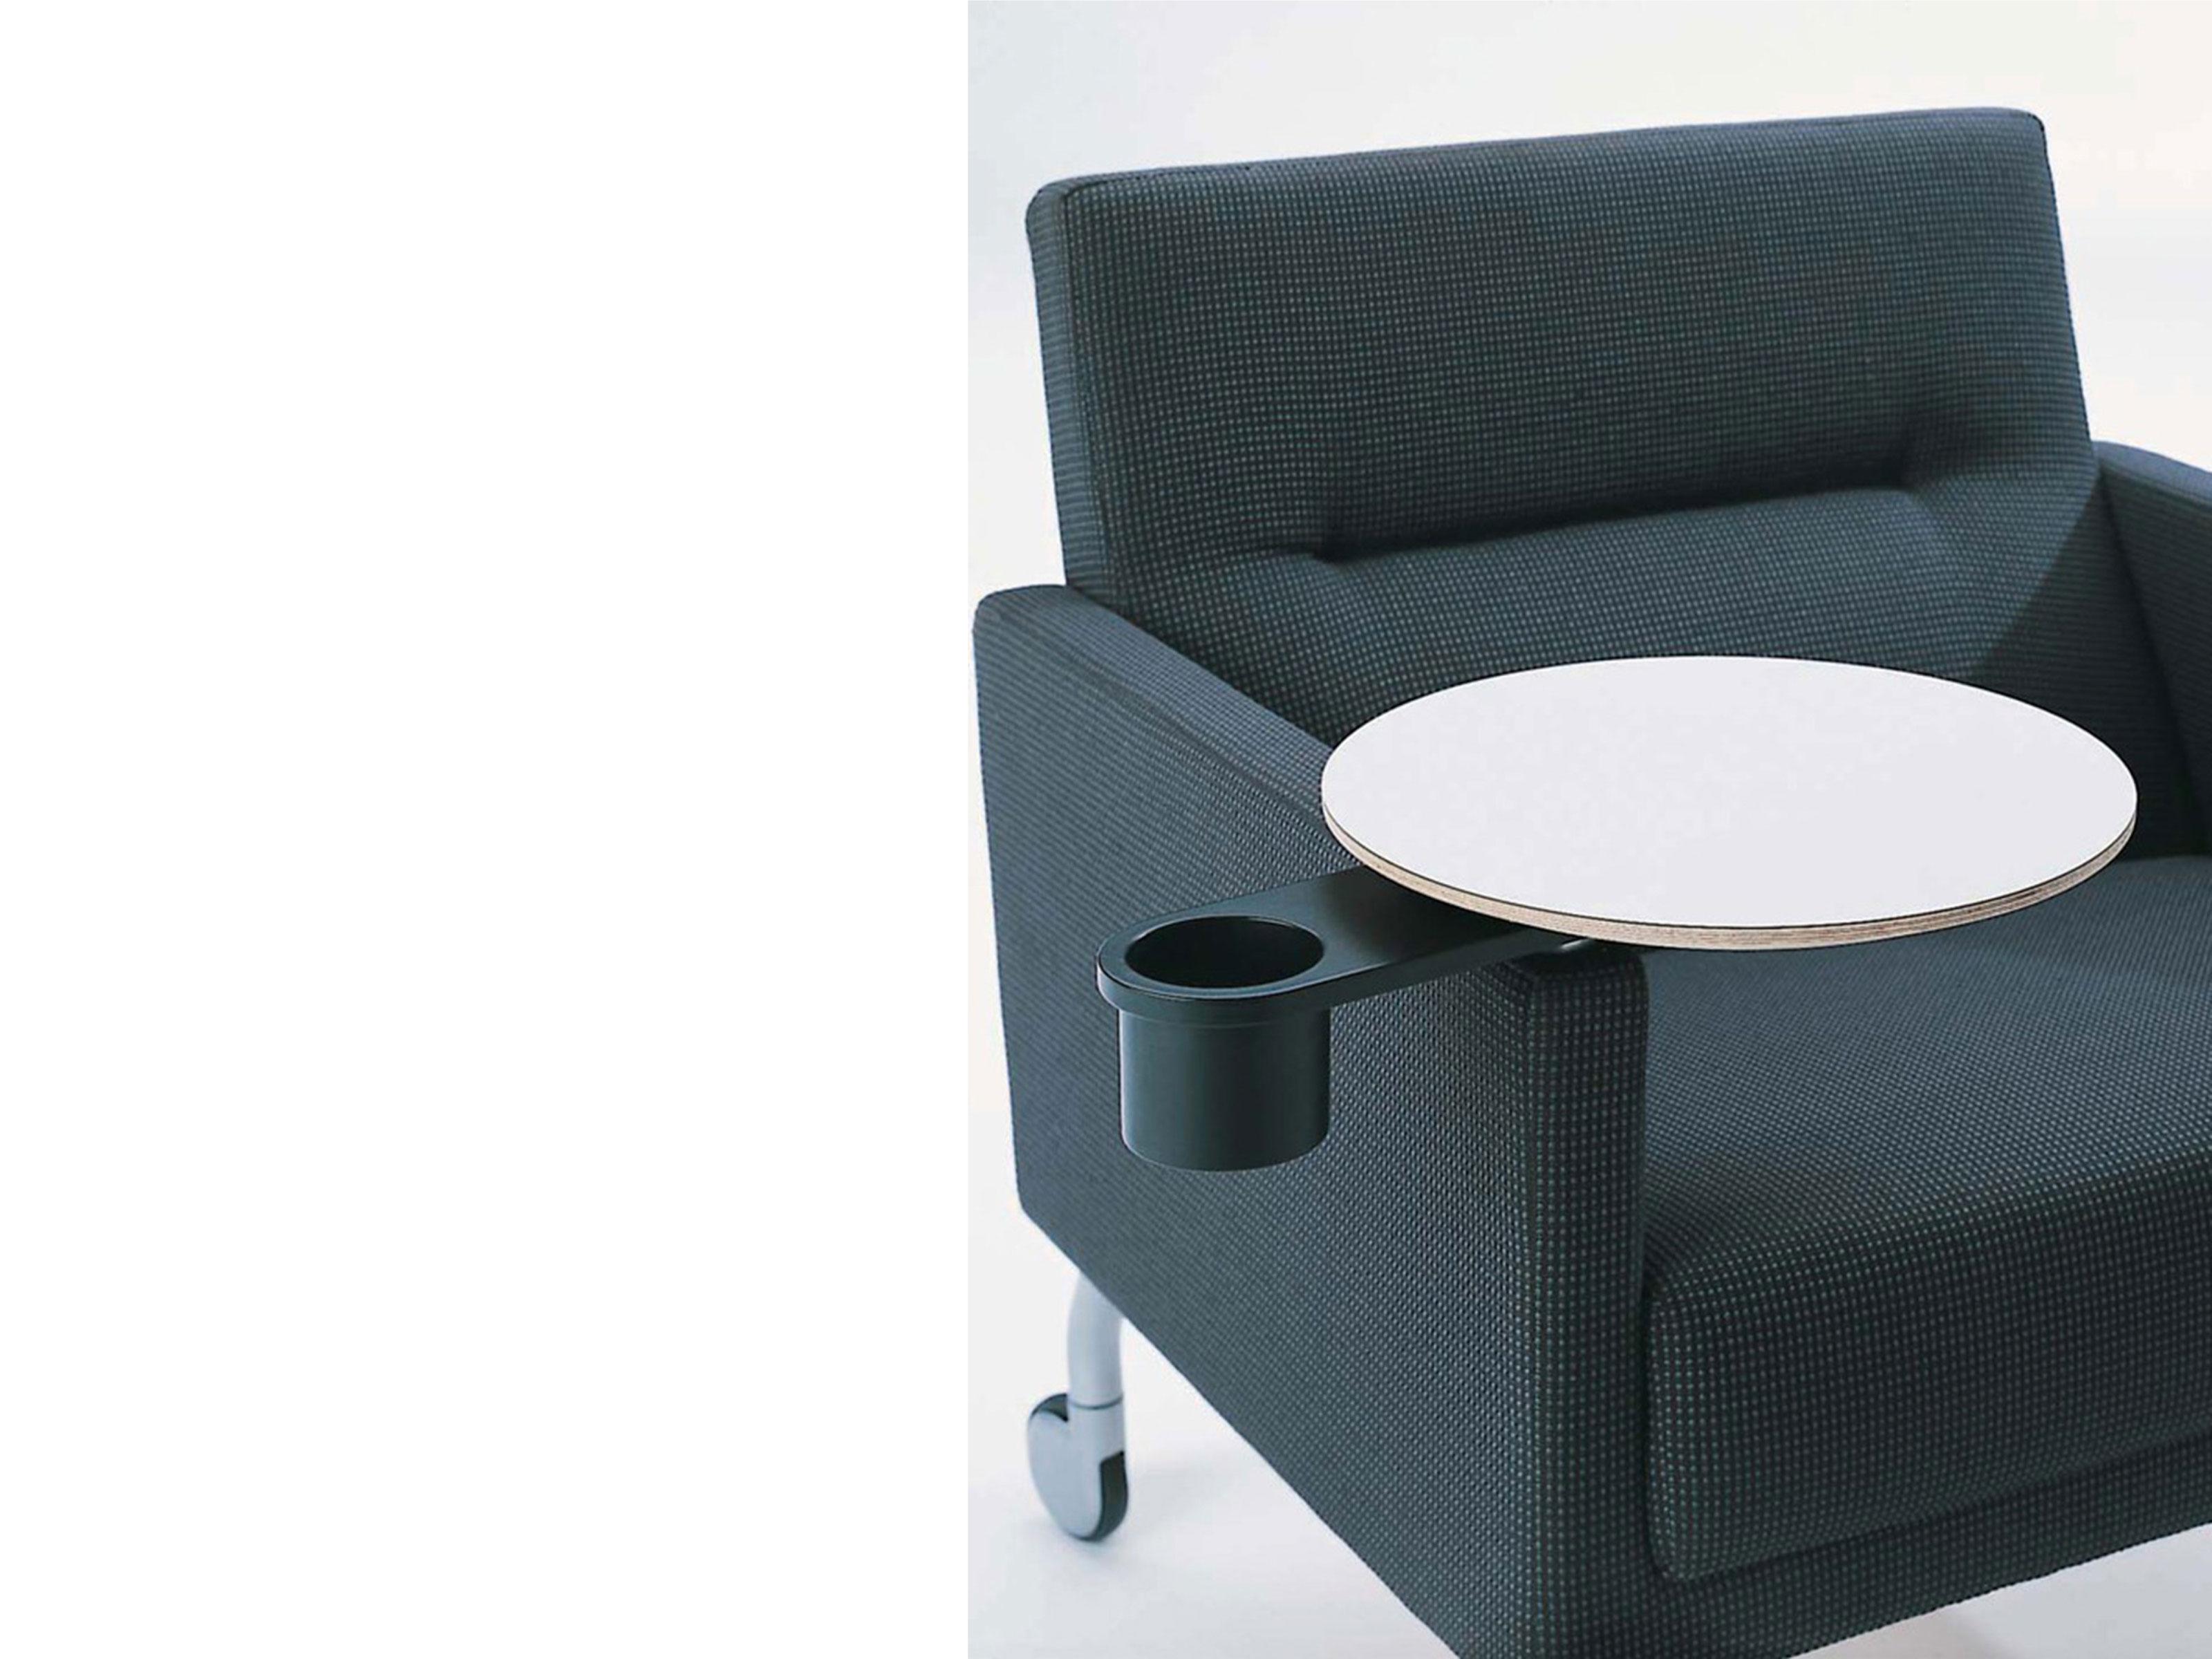 office chair guide walmart bed coalesse sidewalk lounge portable seating - steelcase